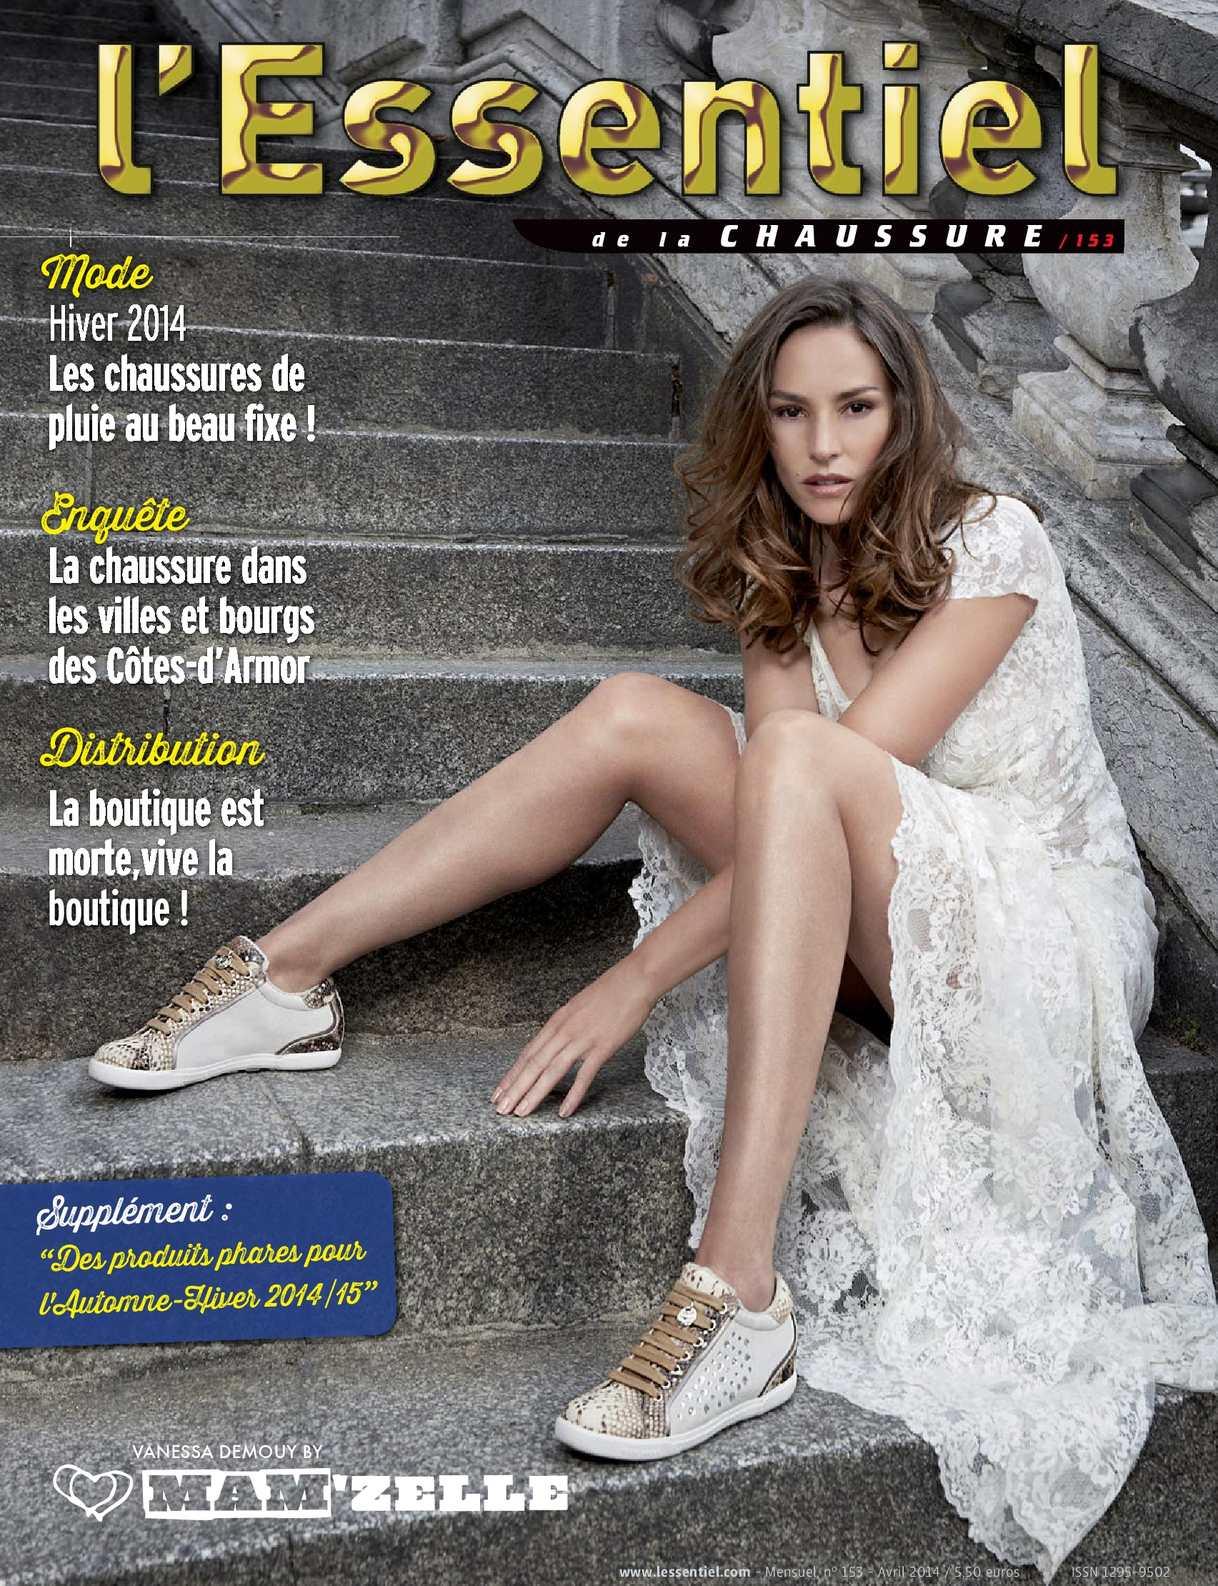 RENNE DESTOCKAGE BALLERINES PANTOUFLE MAISON DE L'ESPADRILLE 38 NEUF 29€ N2